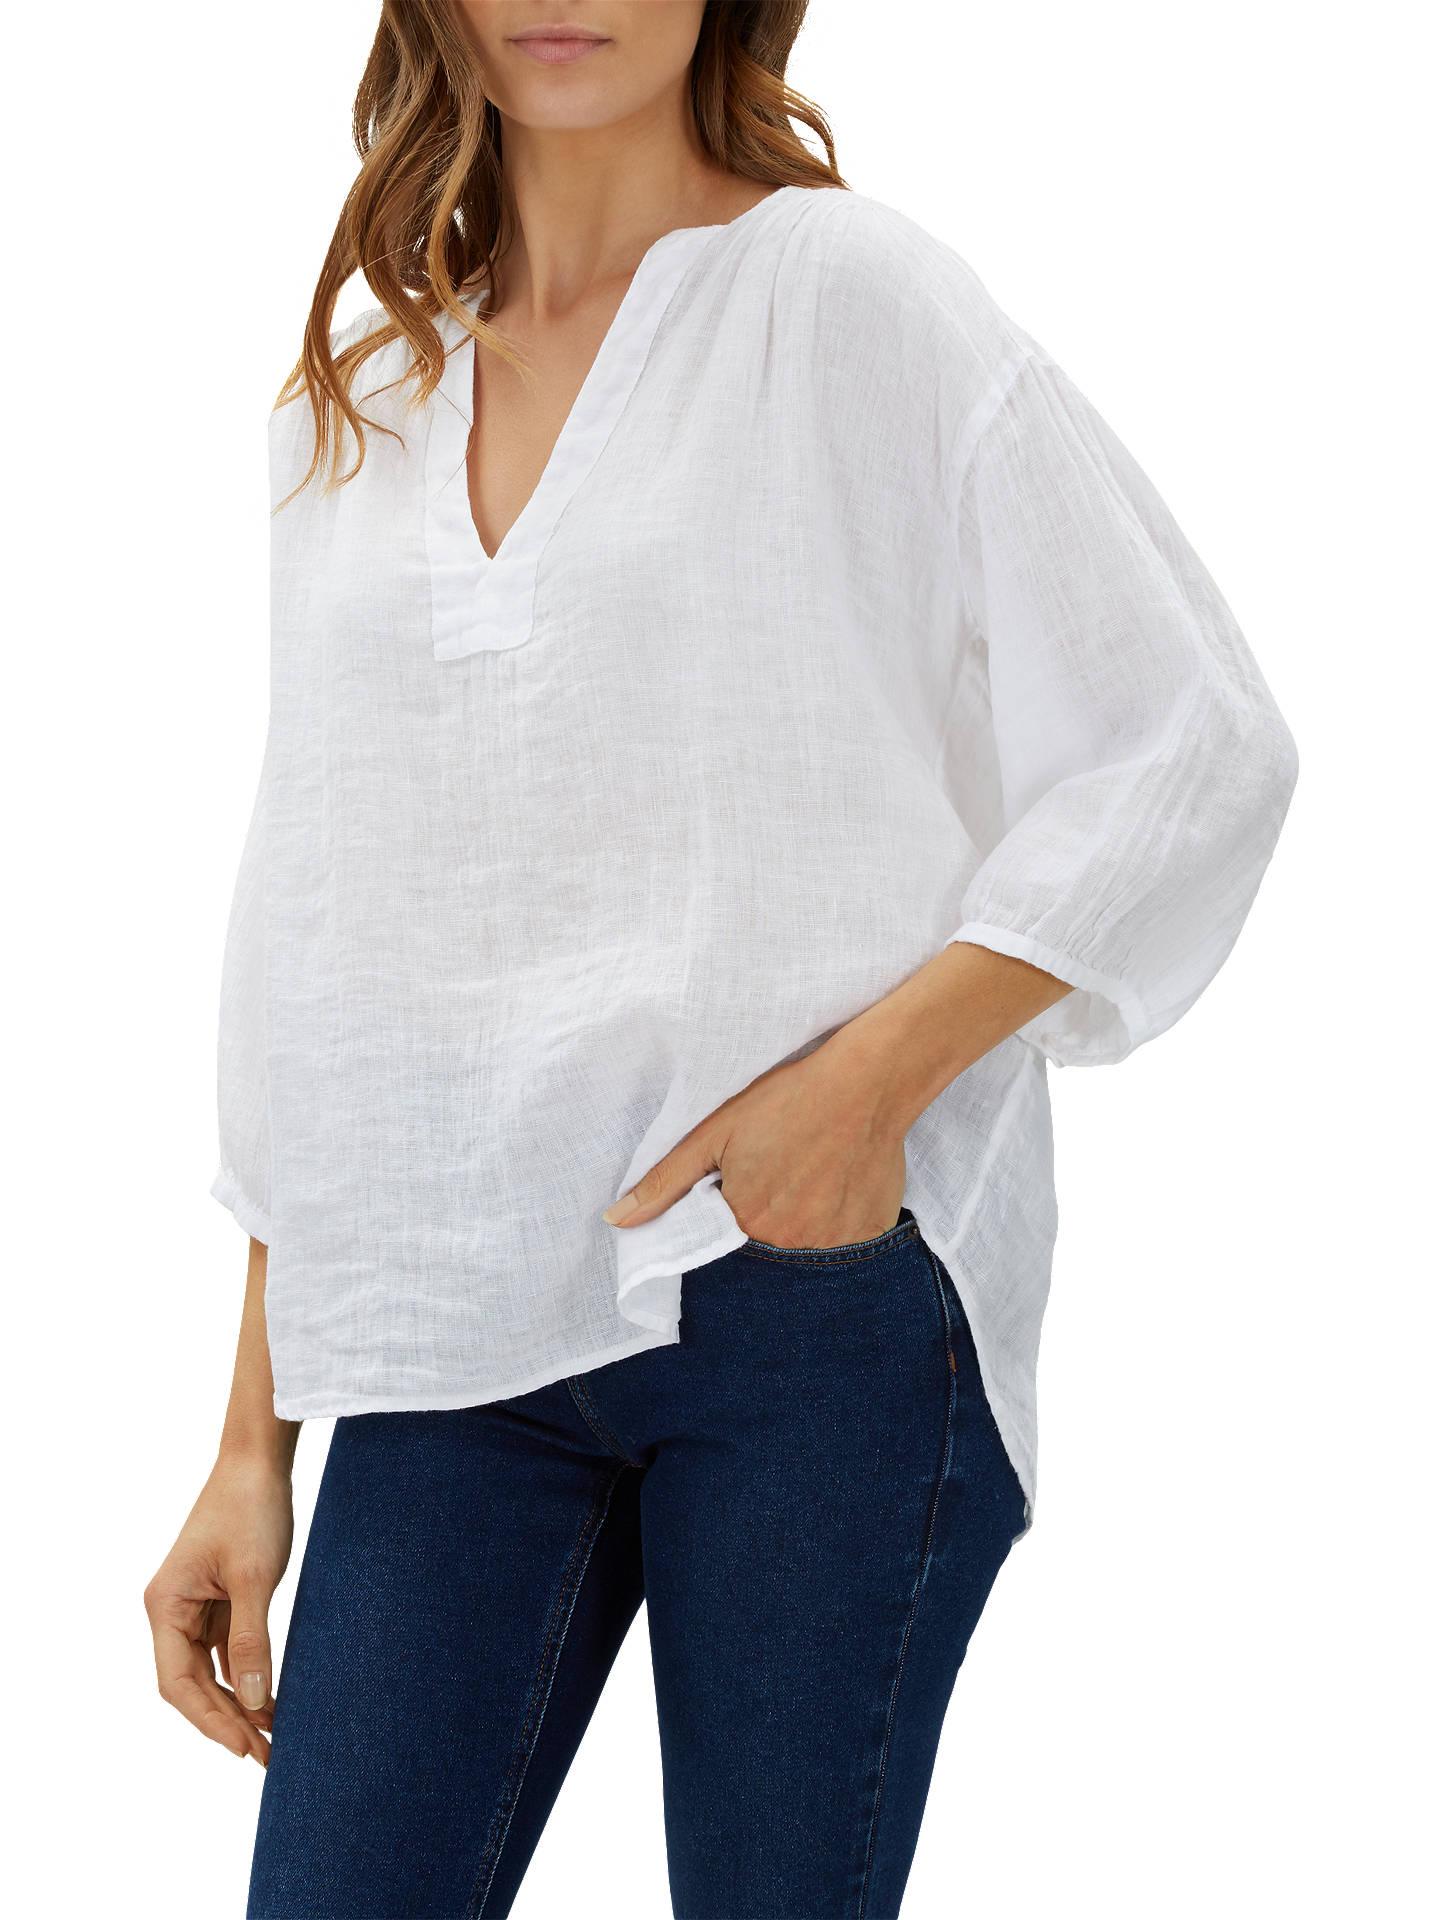 d5335a67 Buy Jaeger Gauze Linen Tunic Top, White, 10 Online at johnlewis.com ...